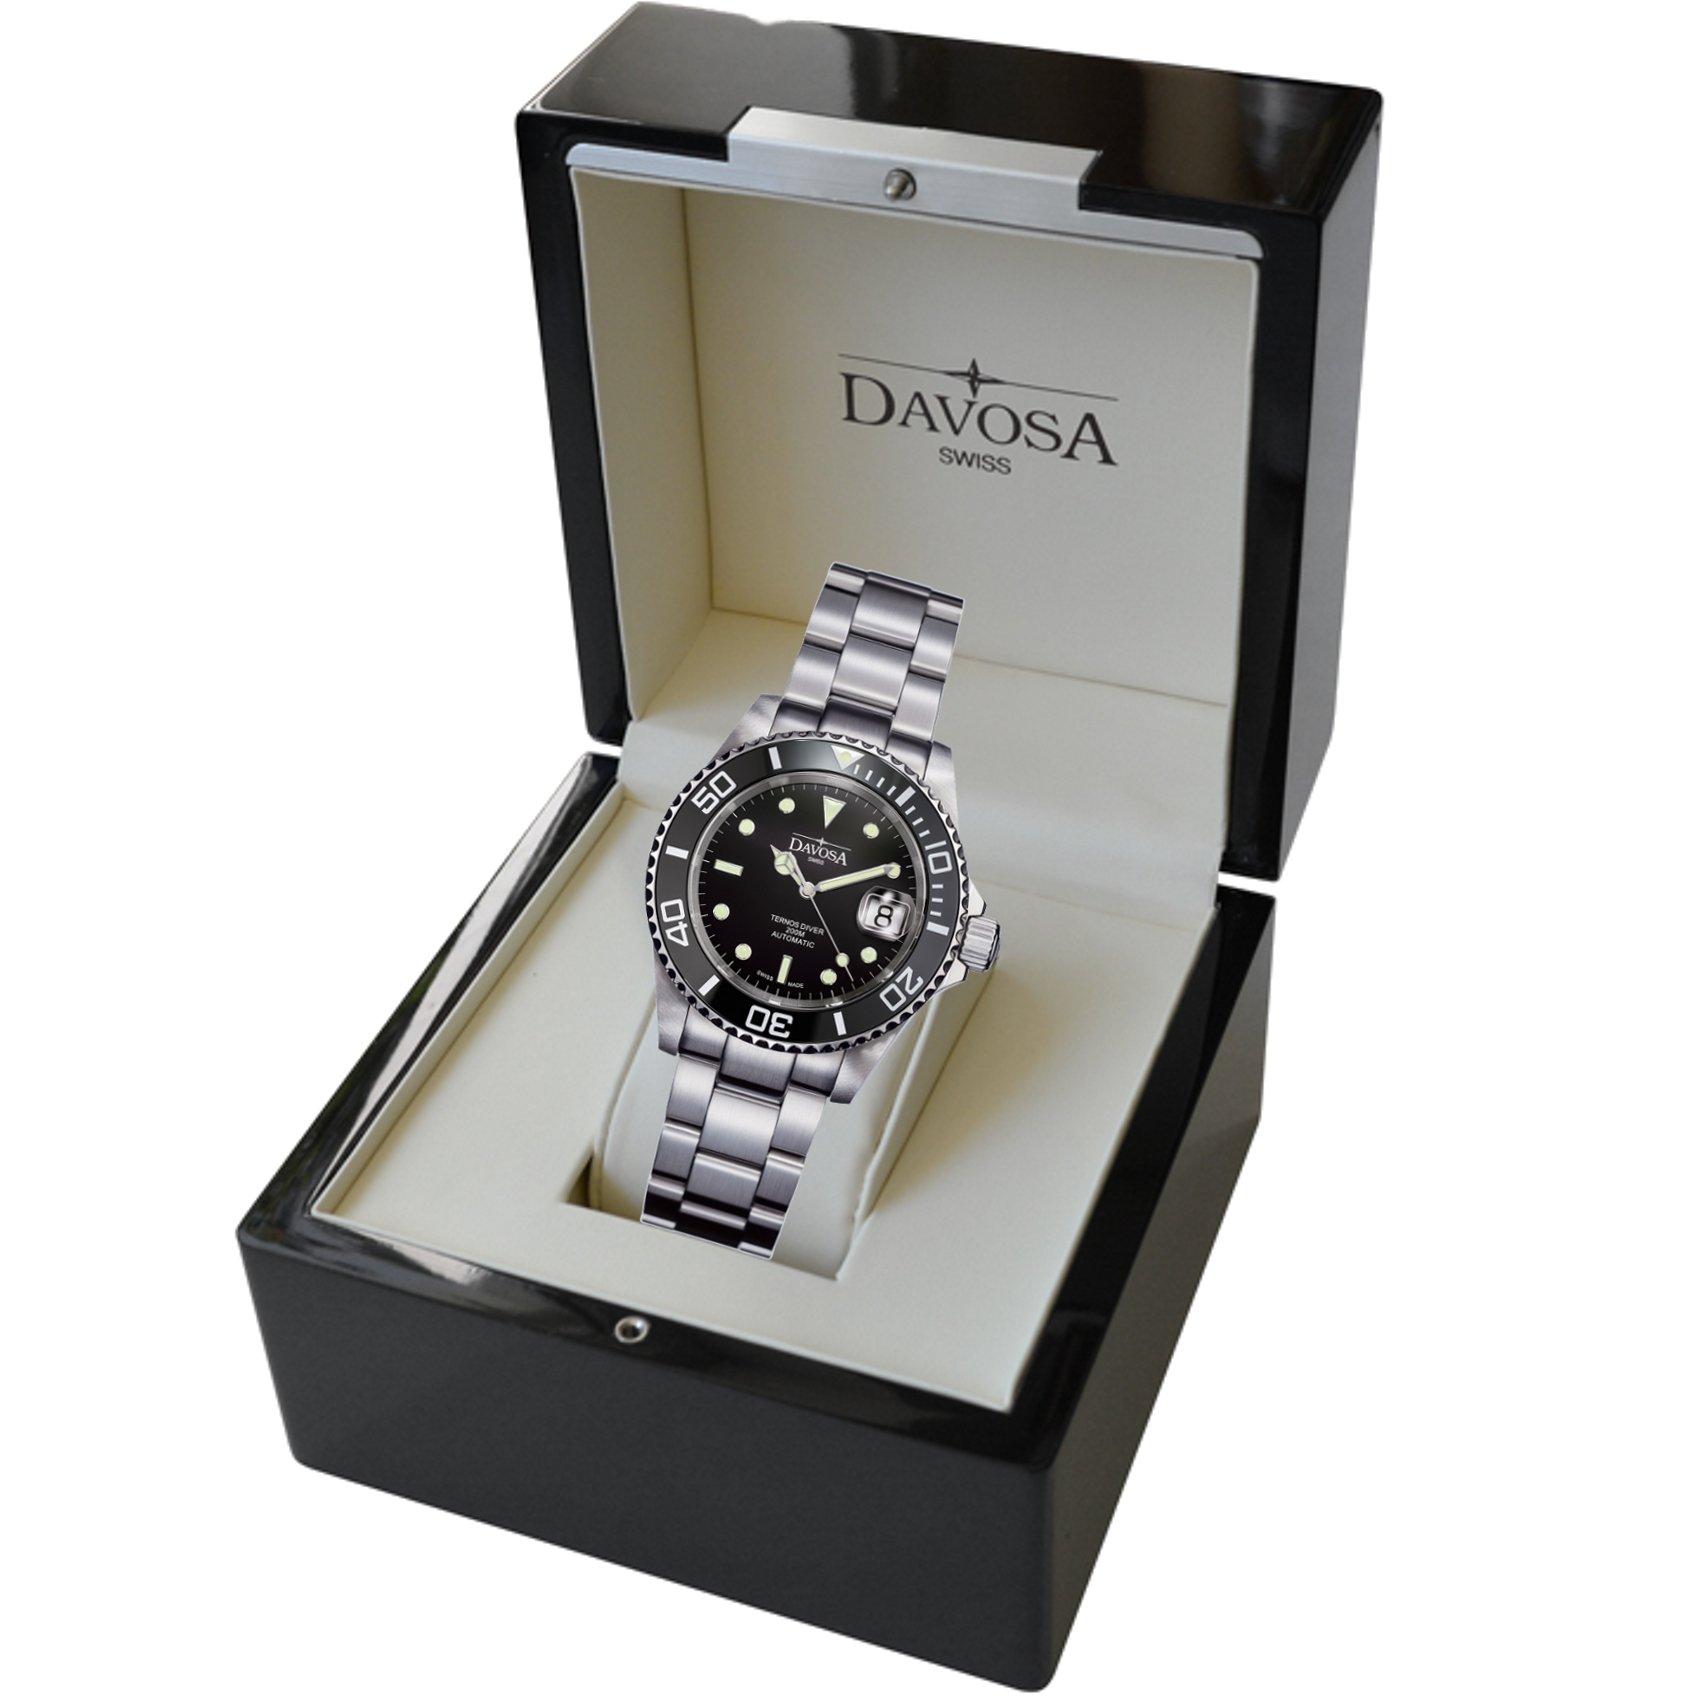 Davosa Swiss Made Men Wrist Watch, Ternos Ceramic 16155550 Professional Automatic Analog Display & Luxury Bezel by Davosa (Image #7)